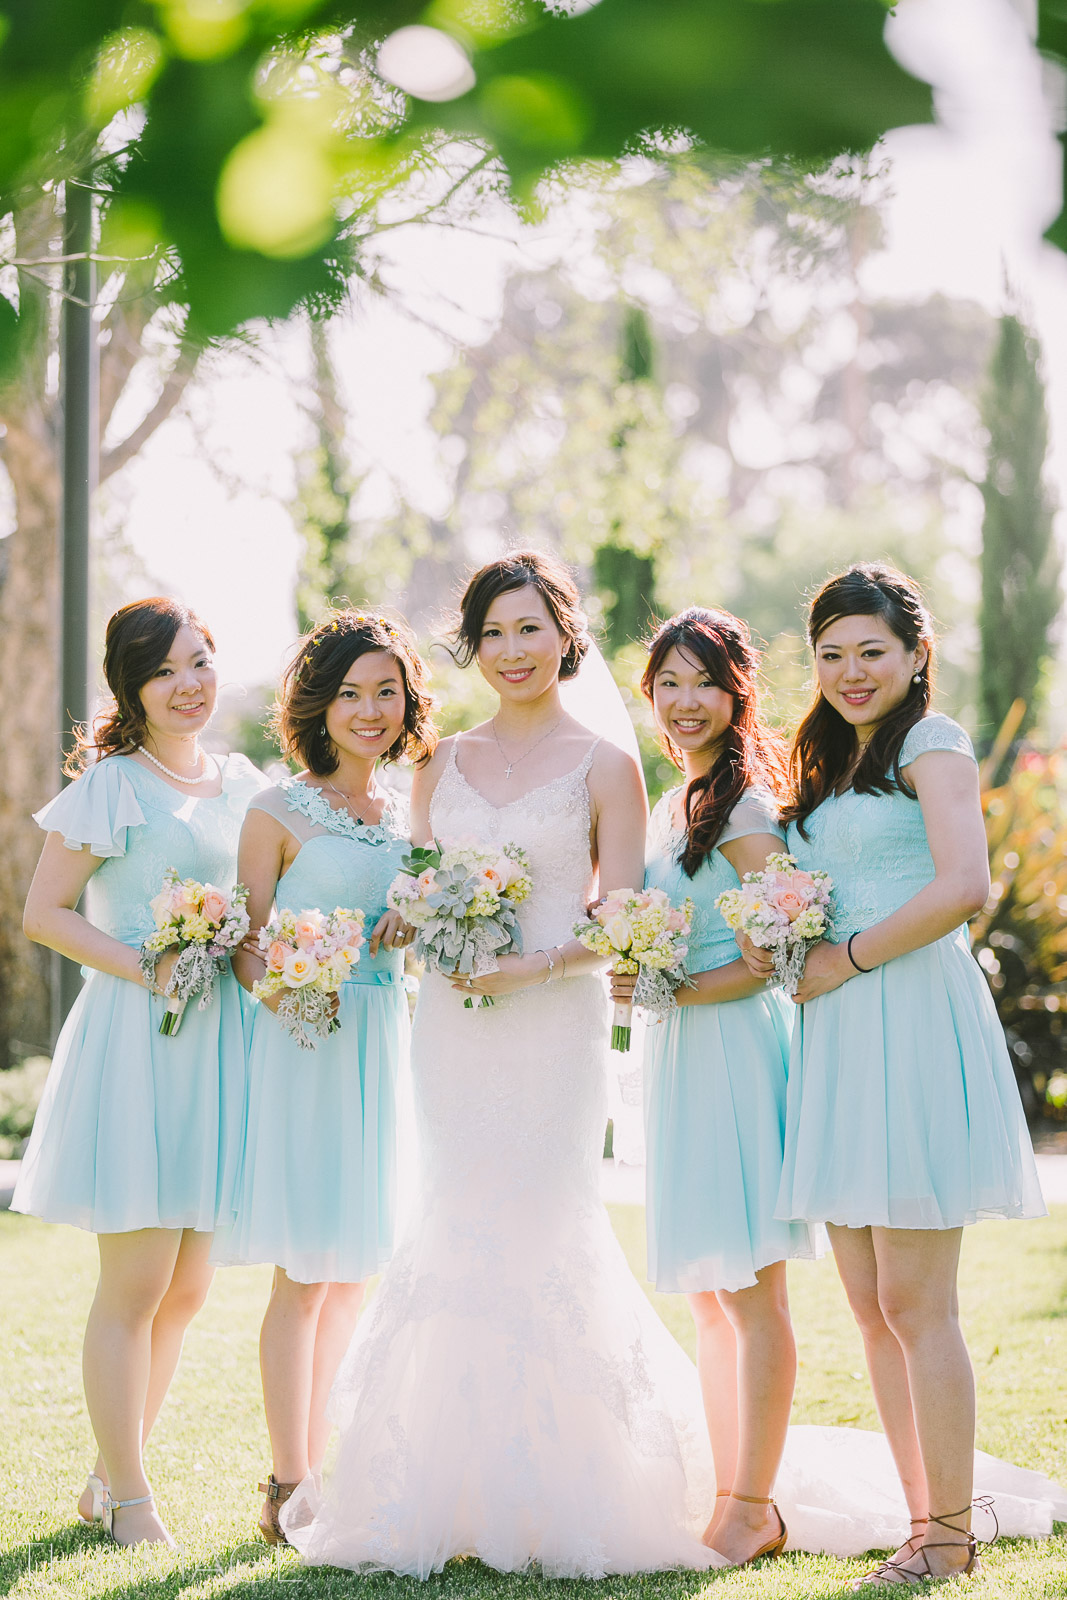 00082-20160612- JuneEdmond-Chung-Wedding.jpg